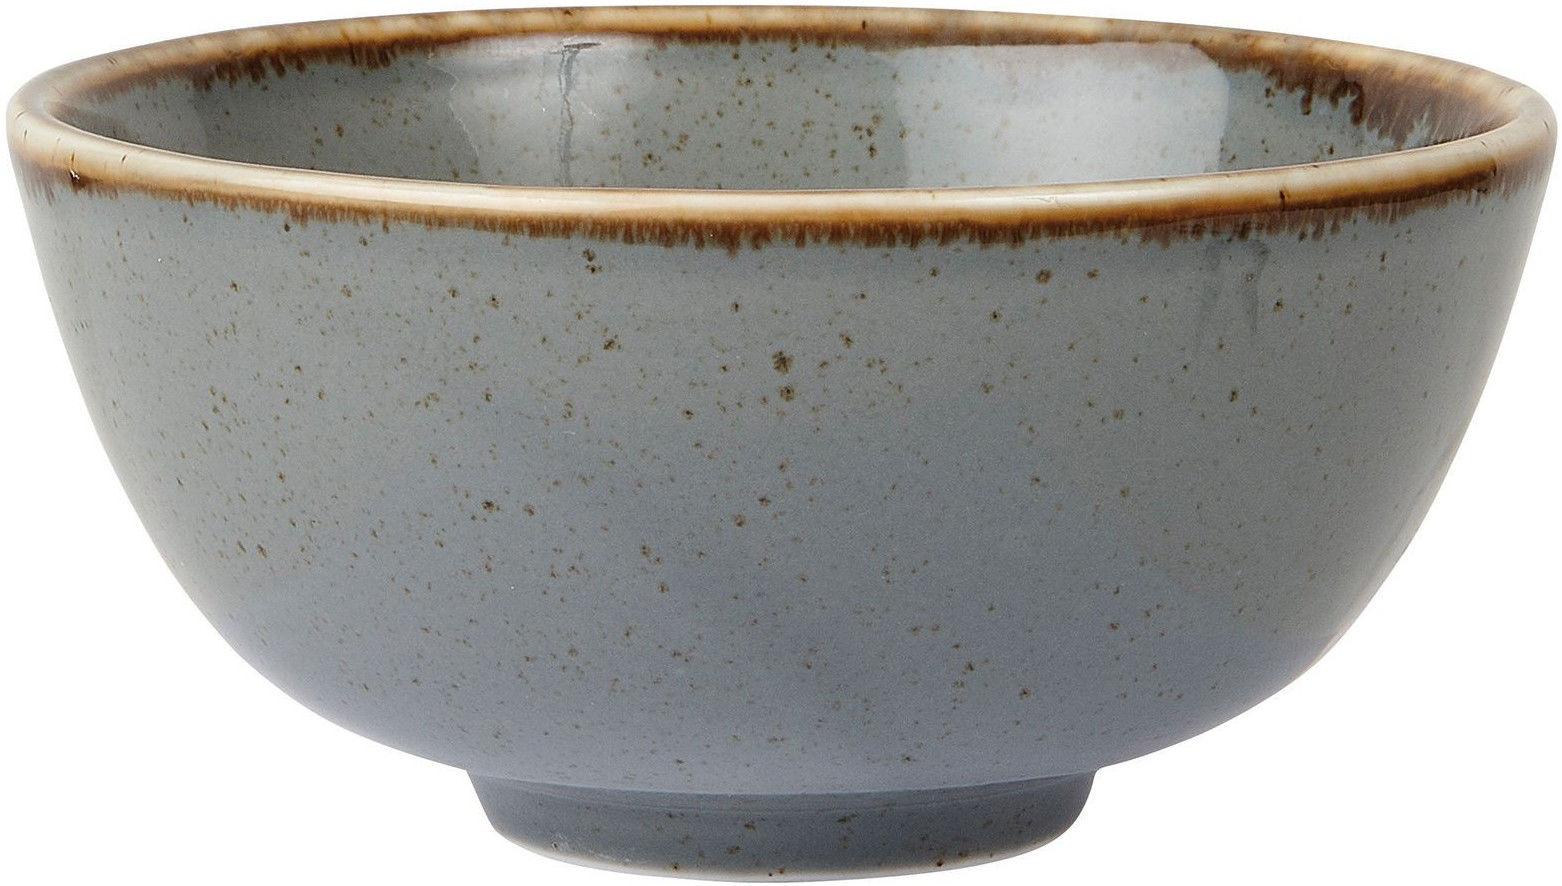 Miska 335 ml Stone porcelana Fine Dine 04ALM002457